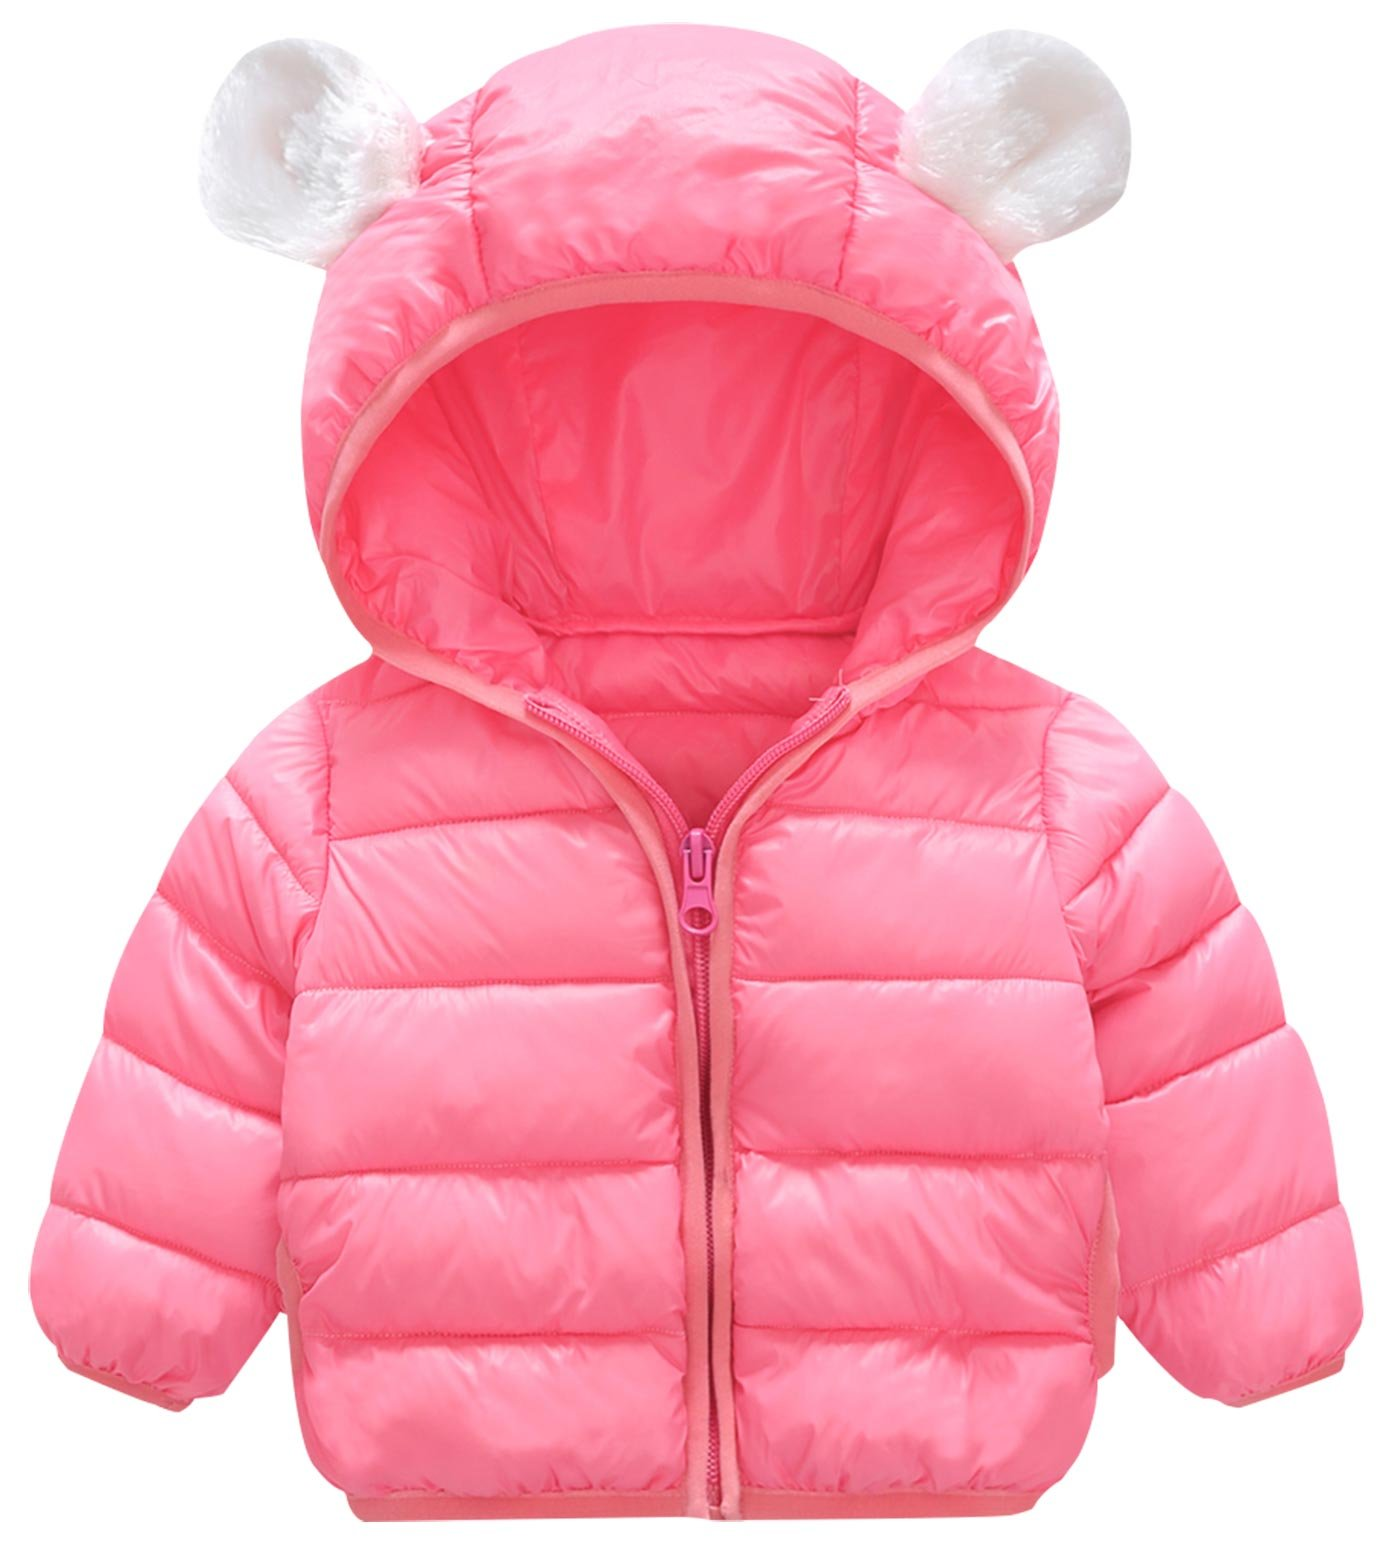 Happy Cherry Unisex Kids Lightweight Winter Puffer Coats Windproof Warm Ear Hoodie Down Cotton Jacket Pink Size 100cm by Happy Cherry